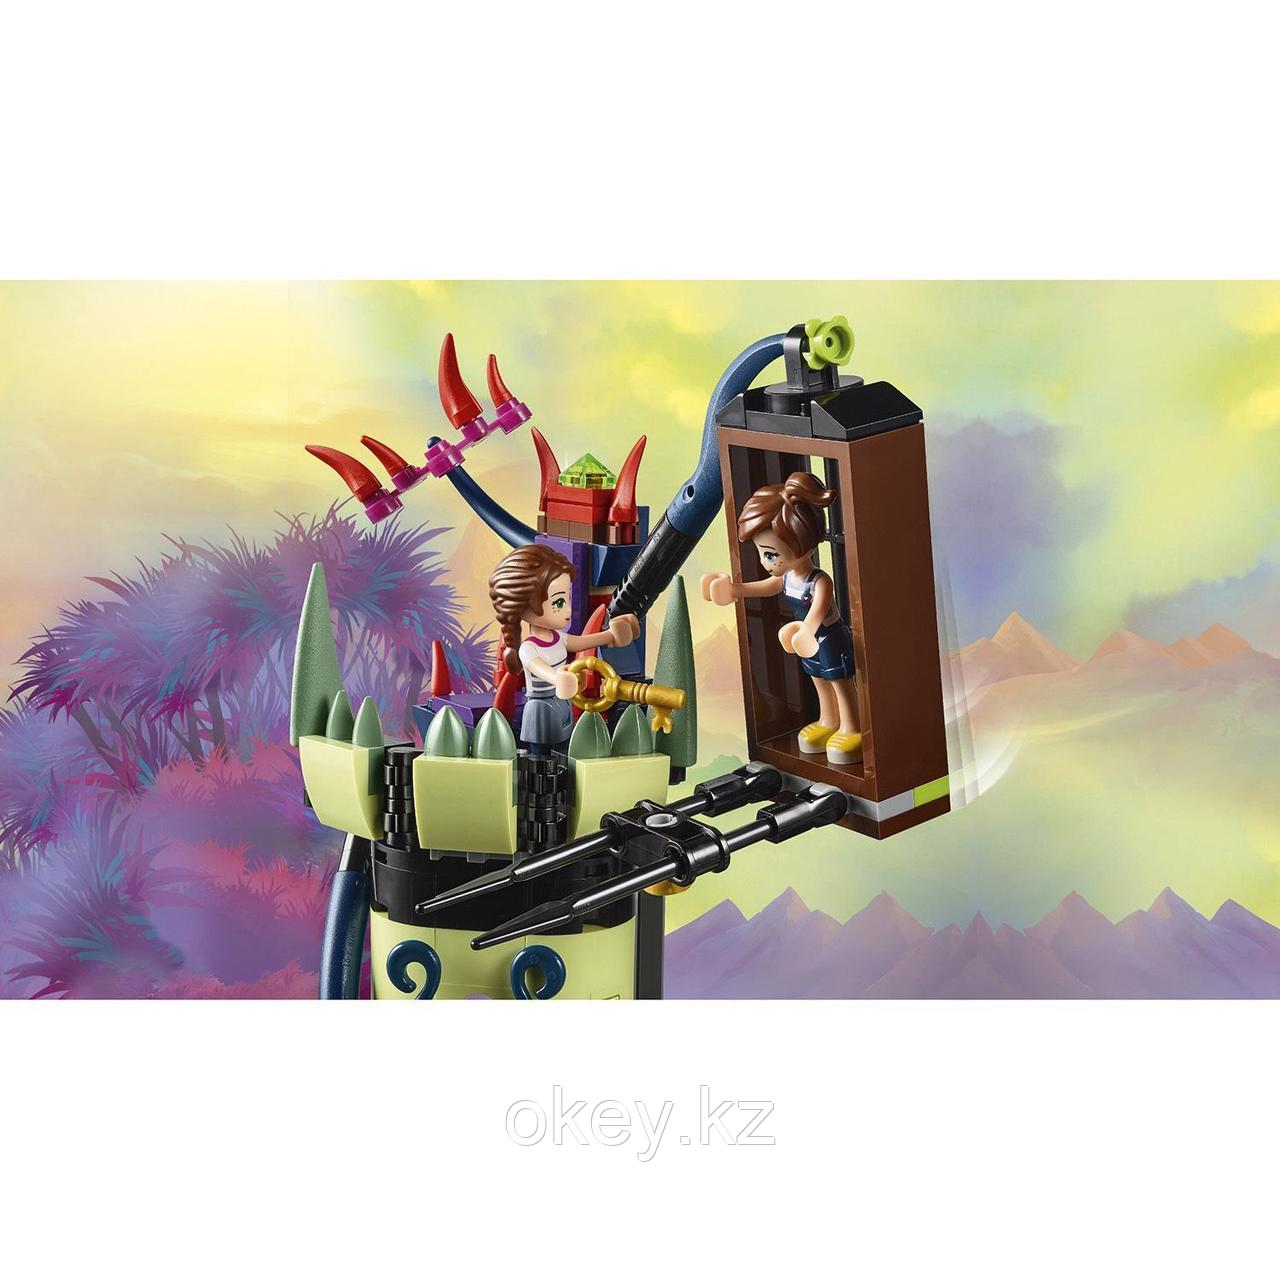 LEGO Elves: Побег из крепости Короля гоблинов 41188 - фото 7